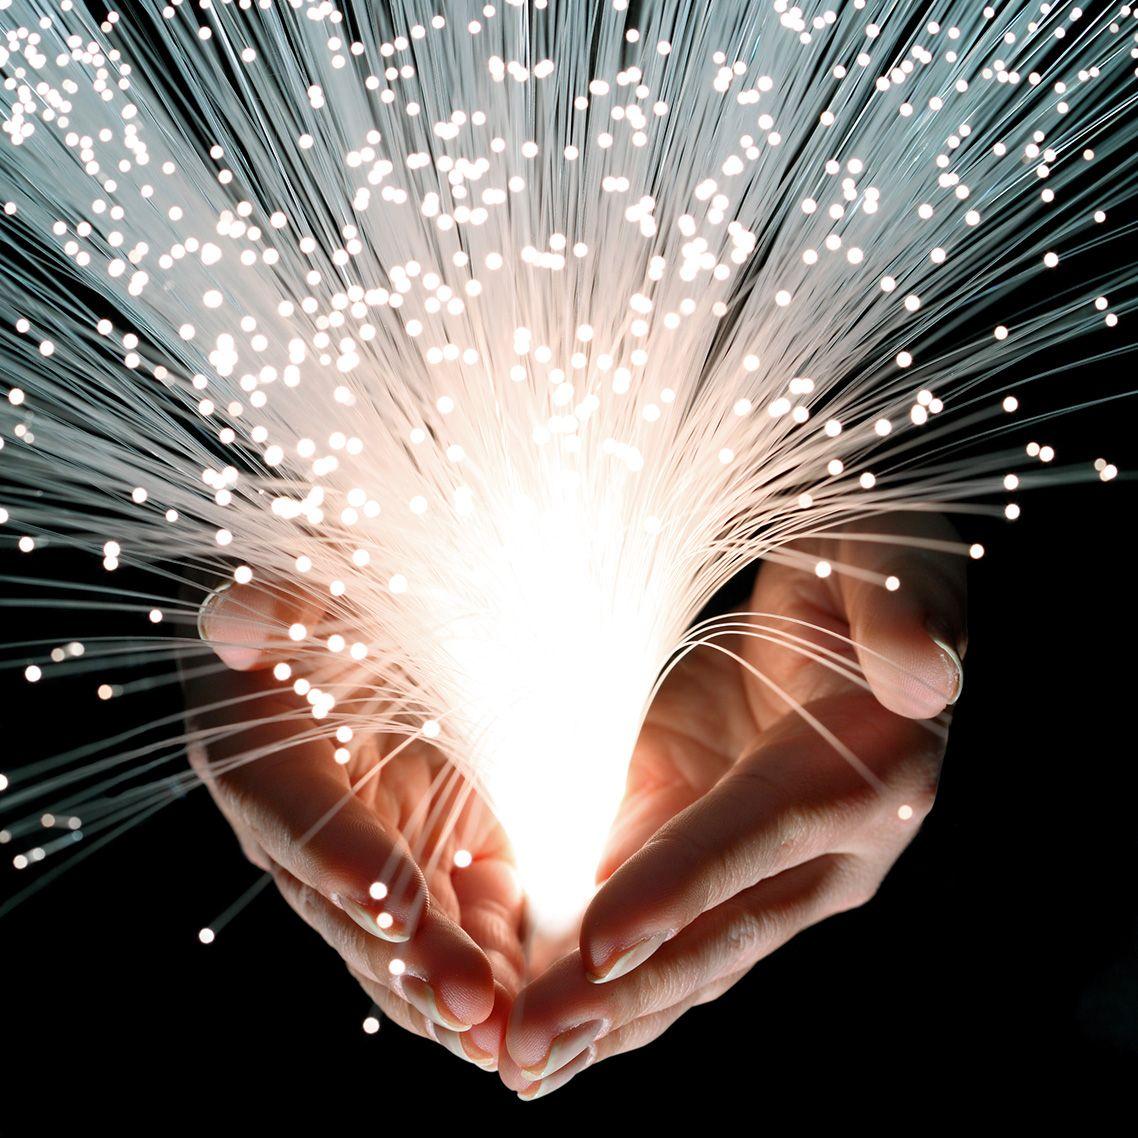 Hands cradle bright white burst of lighted stands of fiber